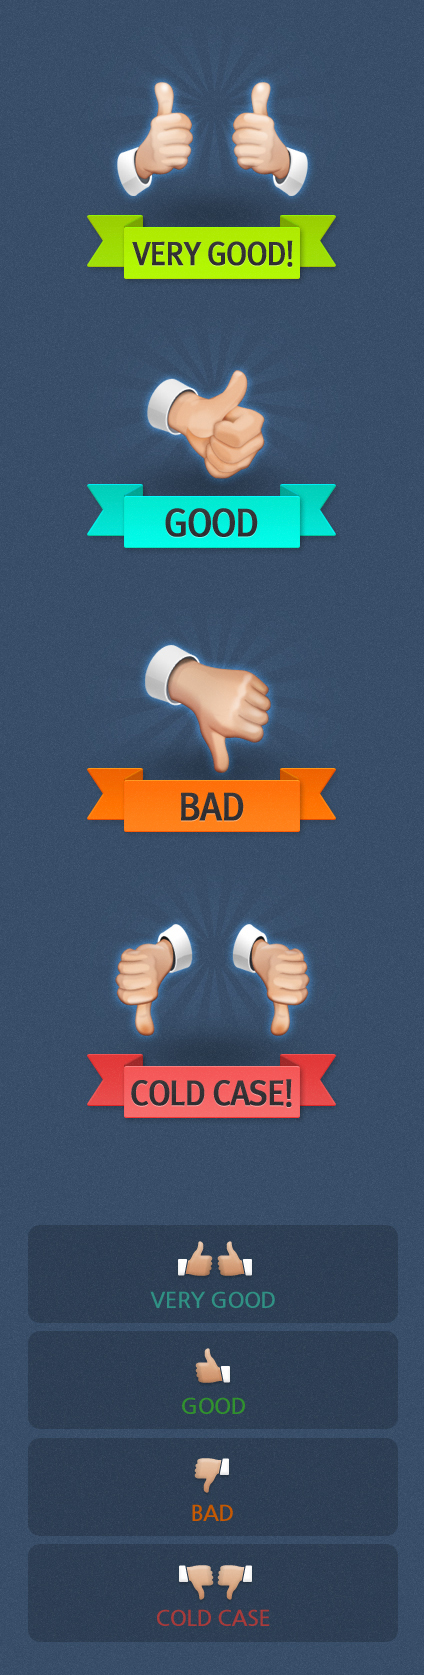 Thumb-Up Icon Set